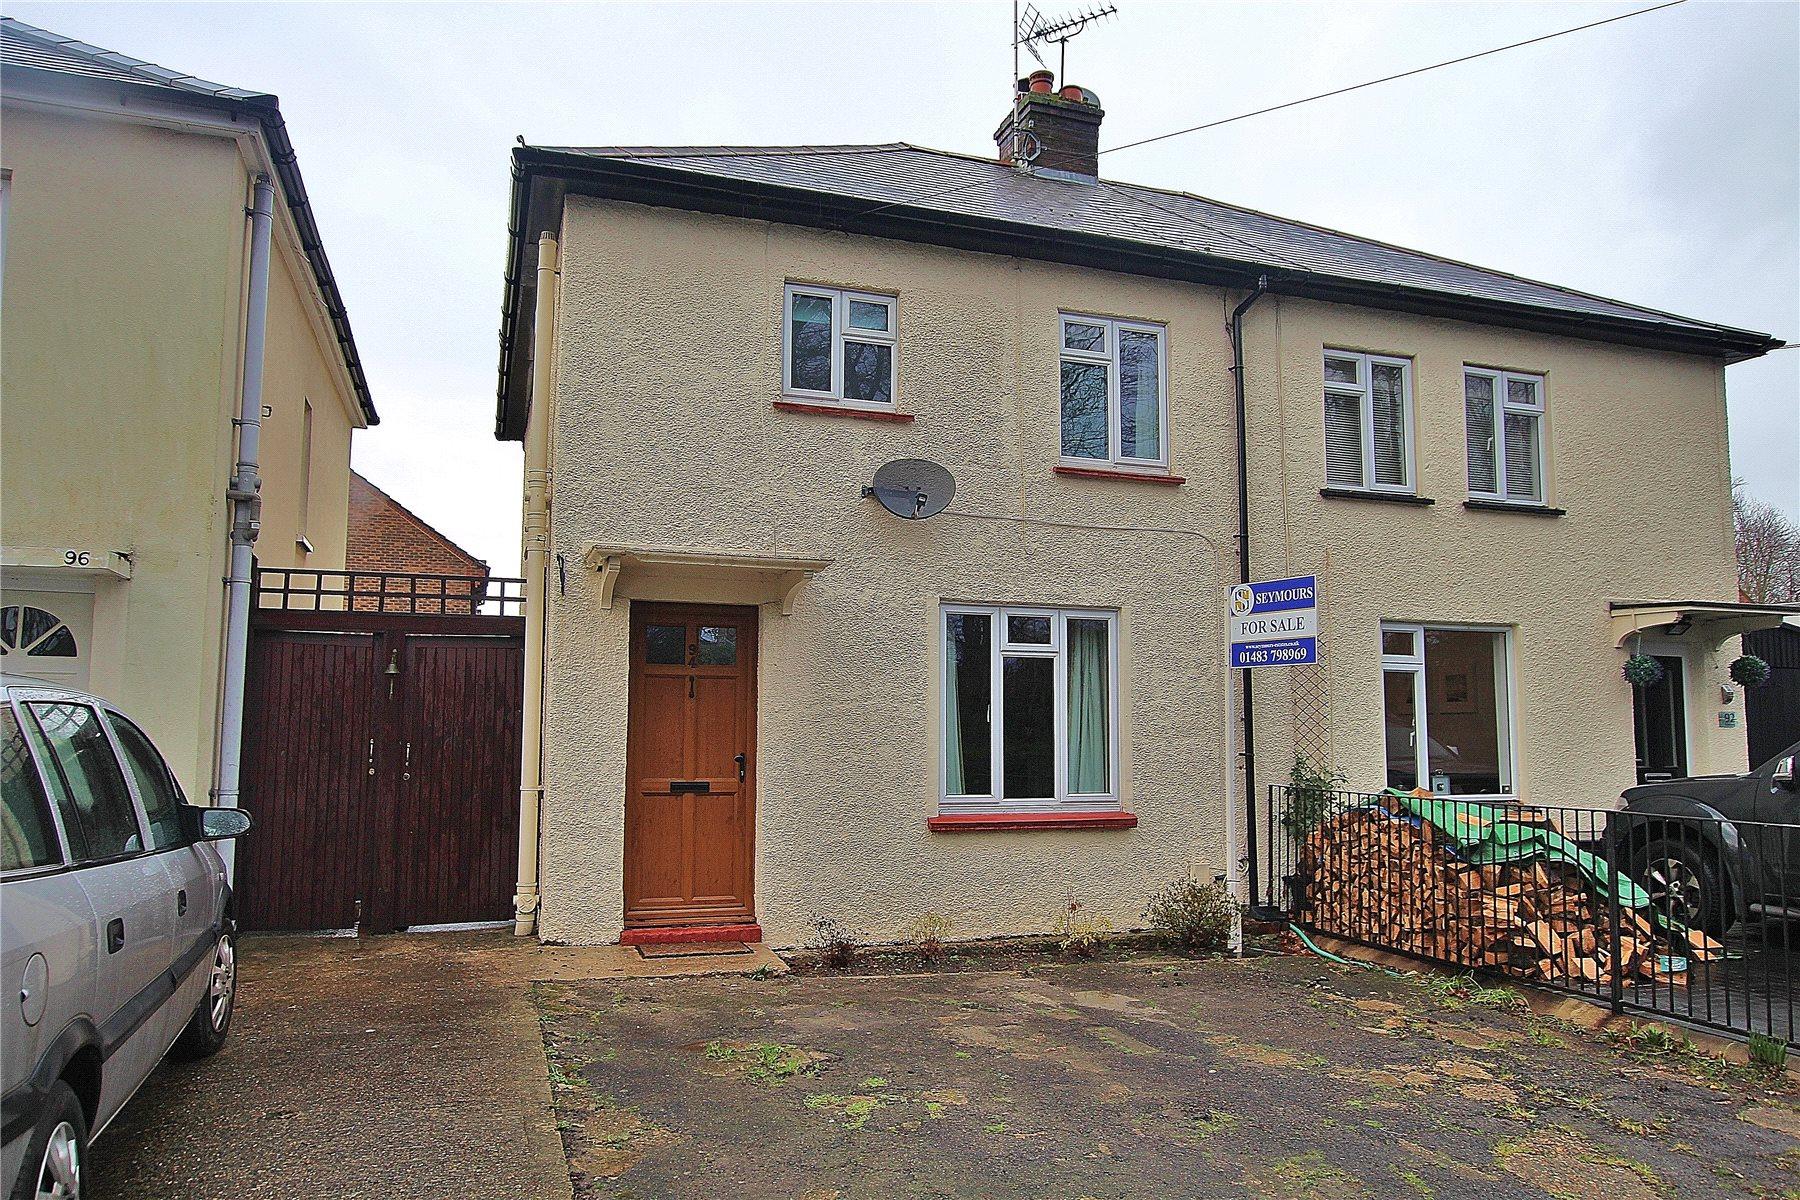 3 Bedrooms Semi Detached House for sale in Broadway, Knaphill, Woking, Surrey, GU21